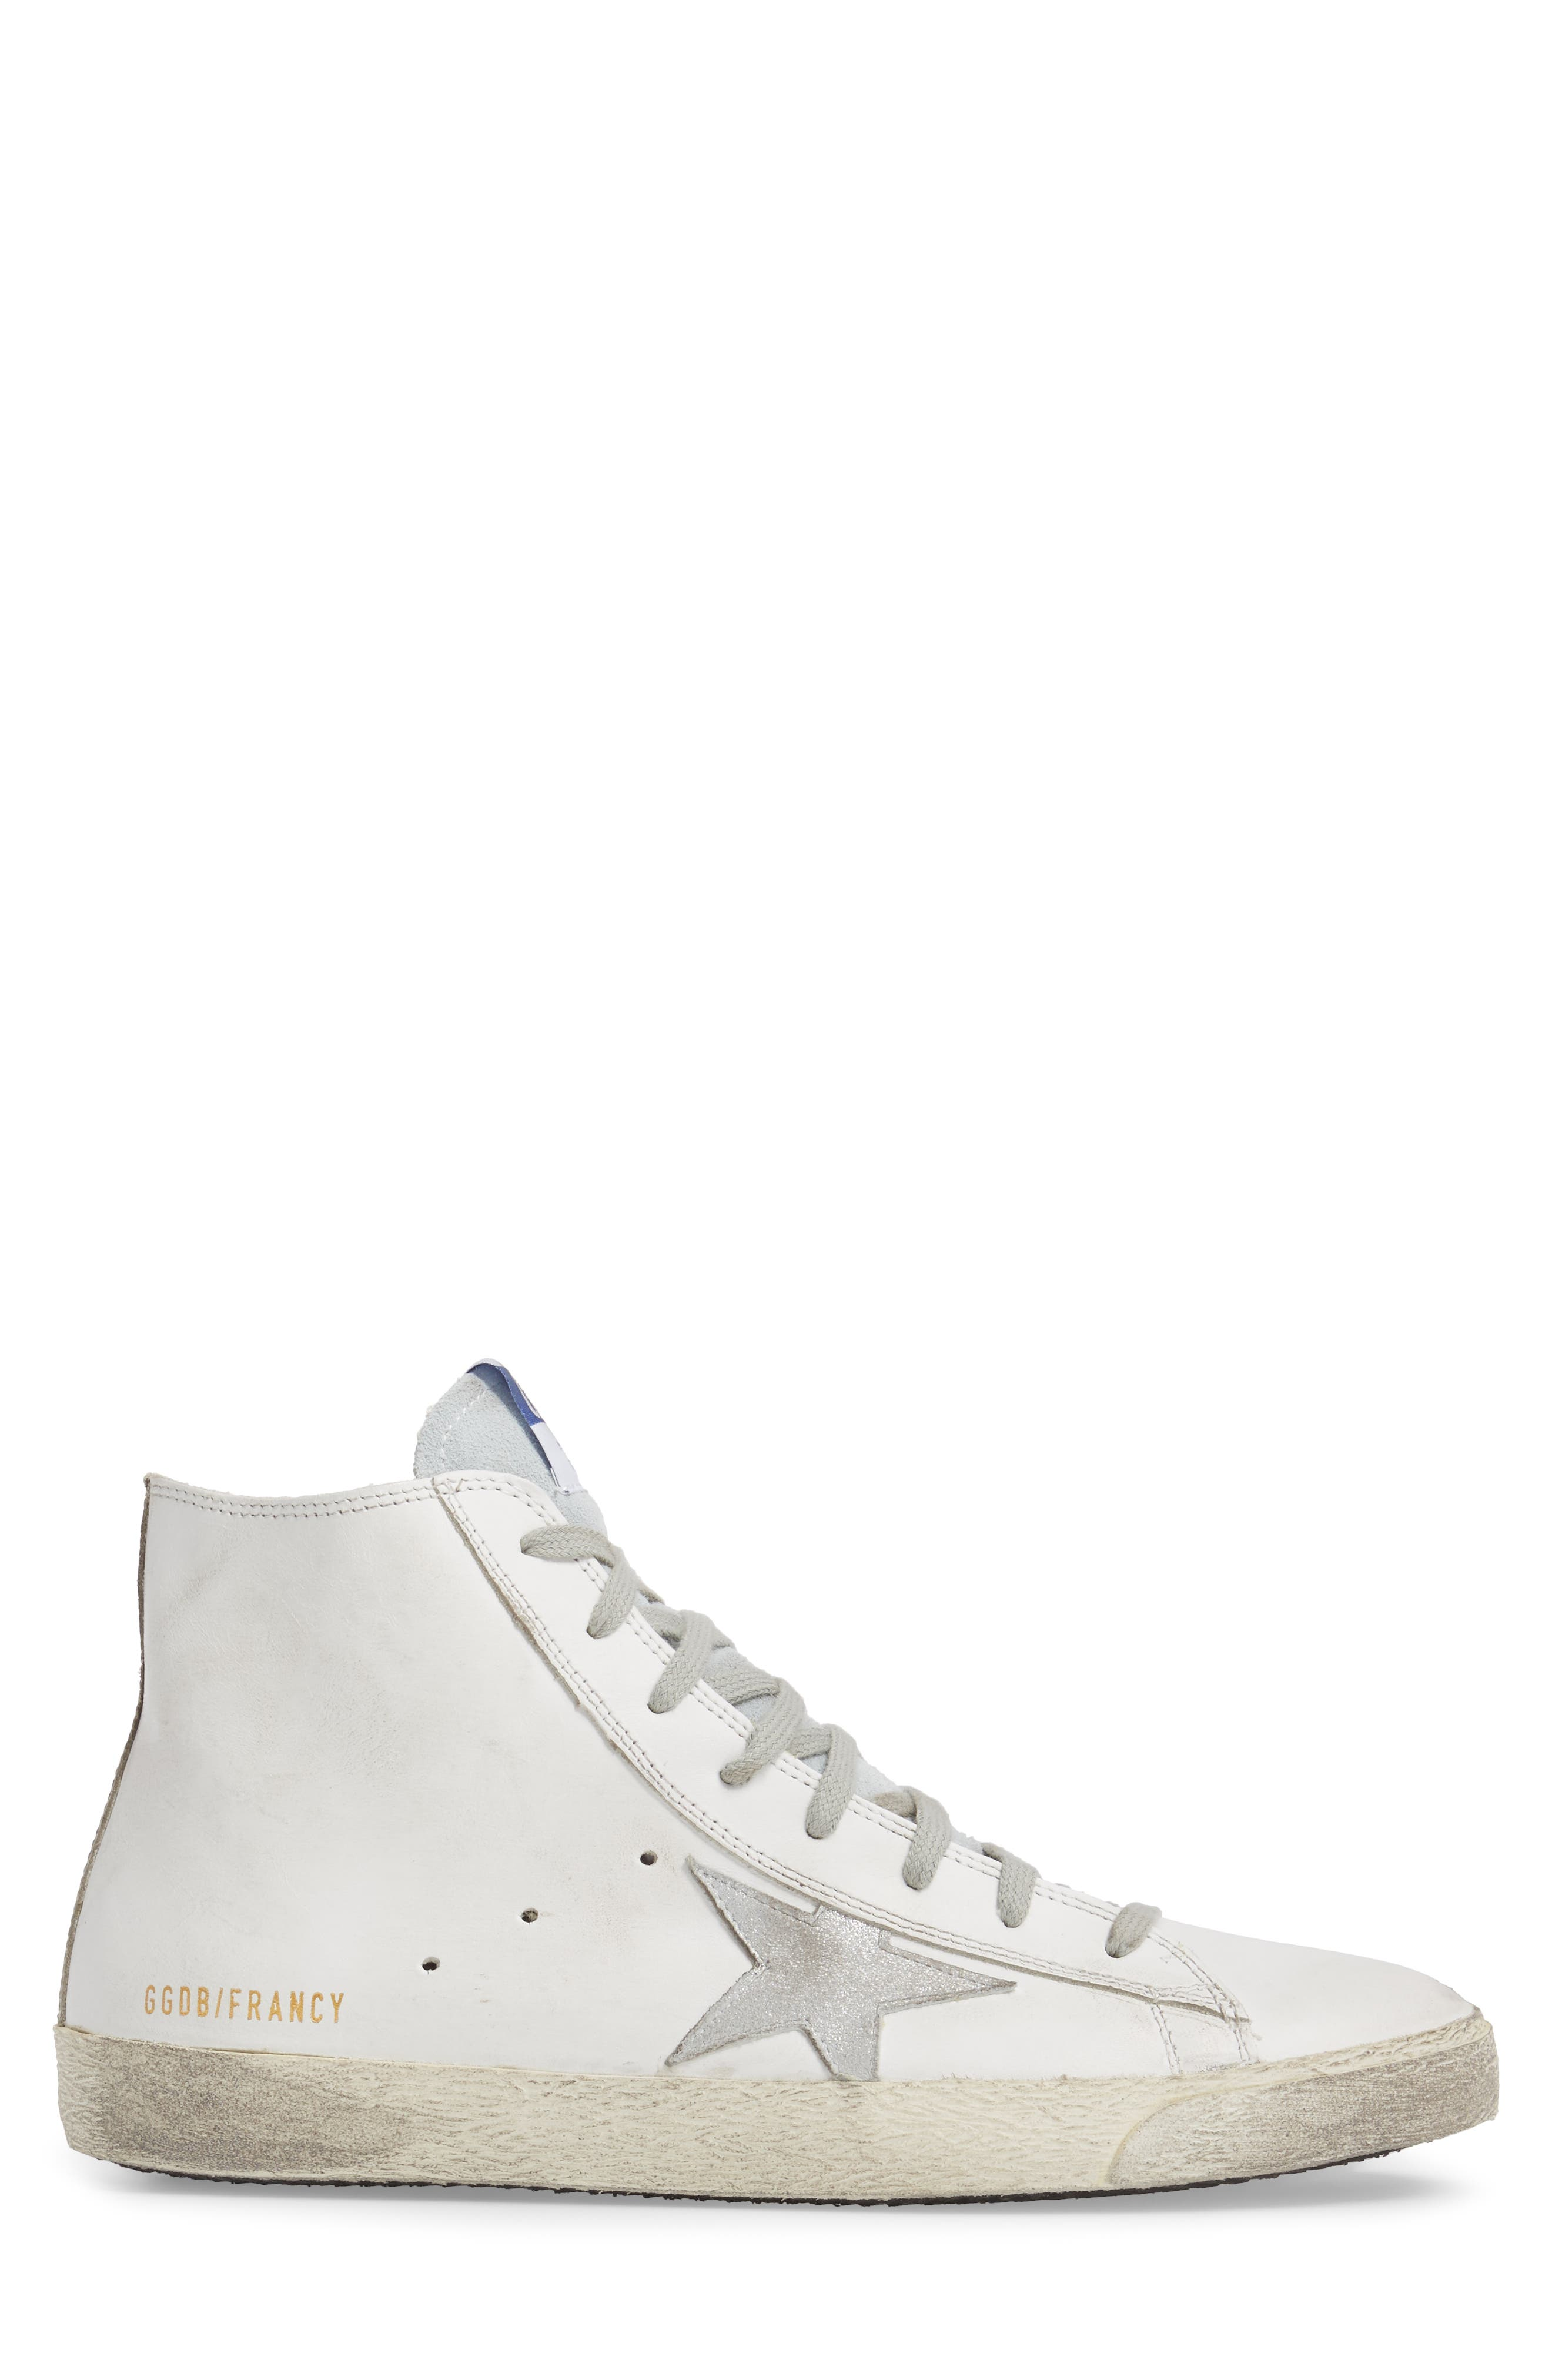 Francy High Top Sneaker,                             Alternate thumbnail 3, color,                             100